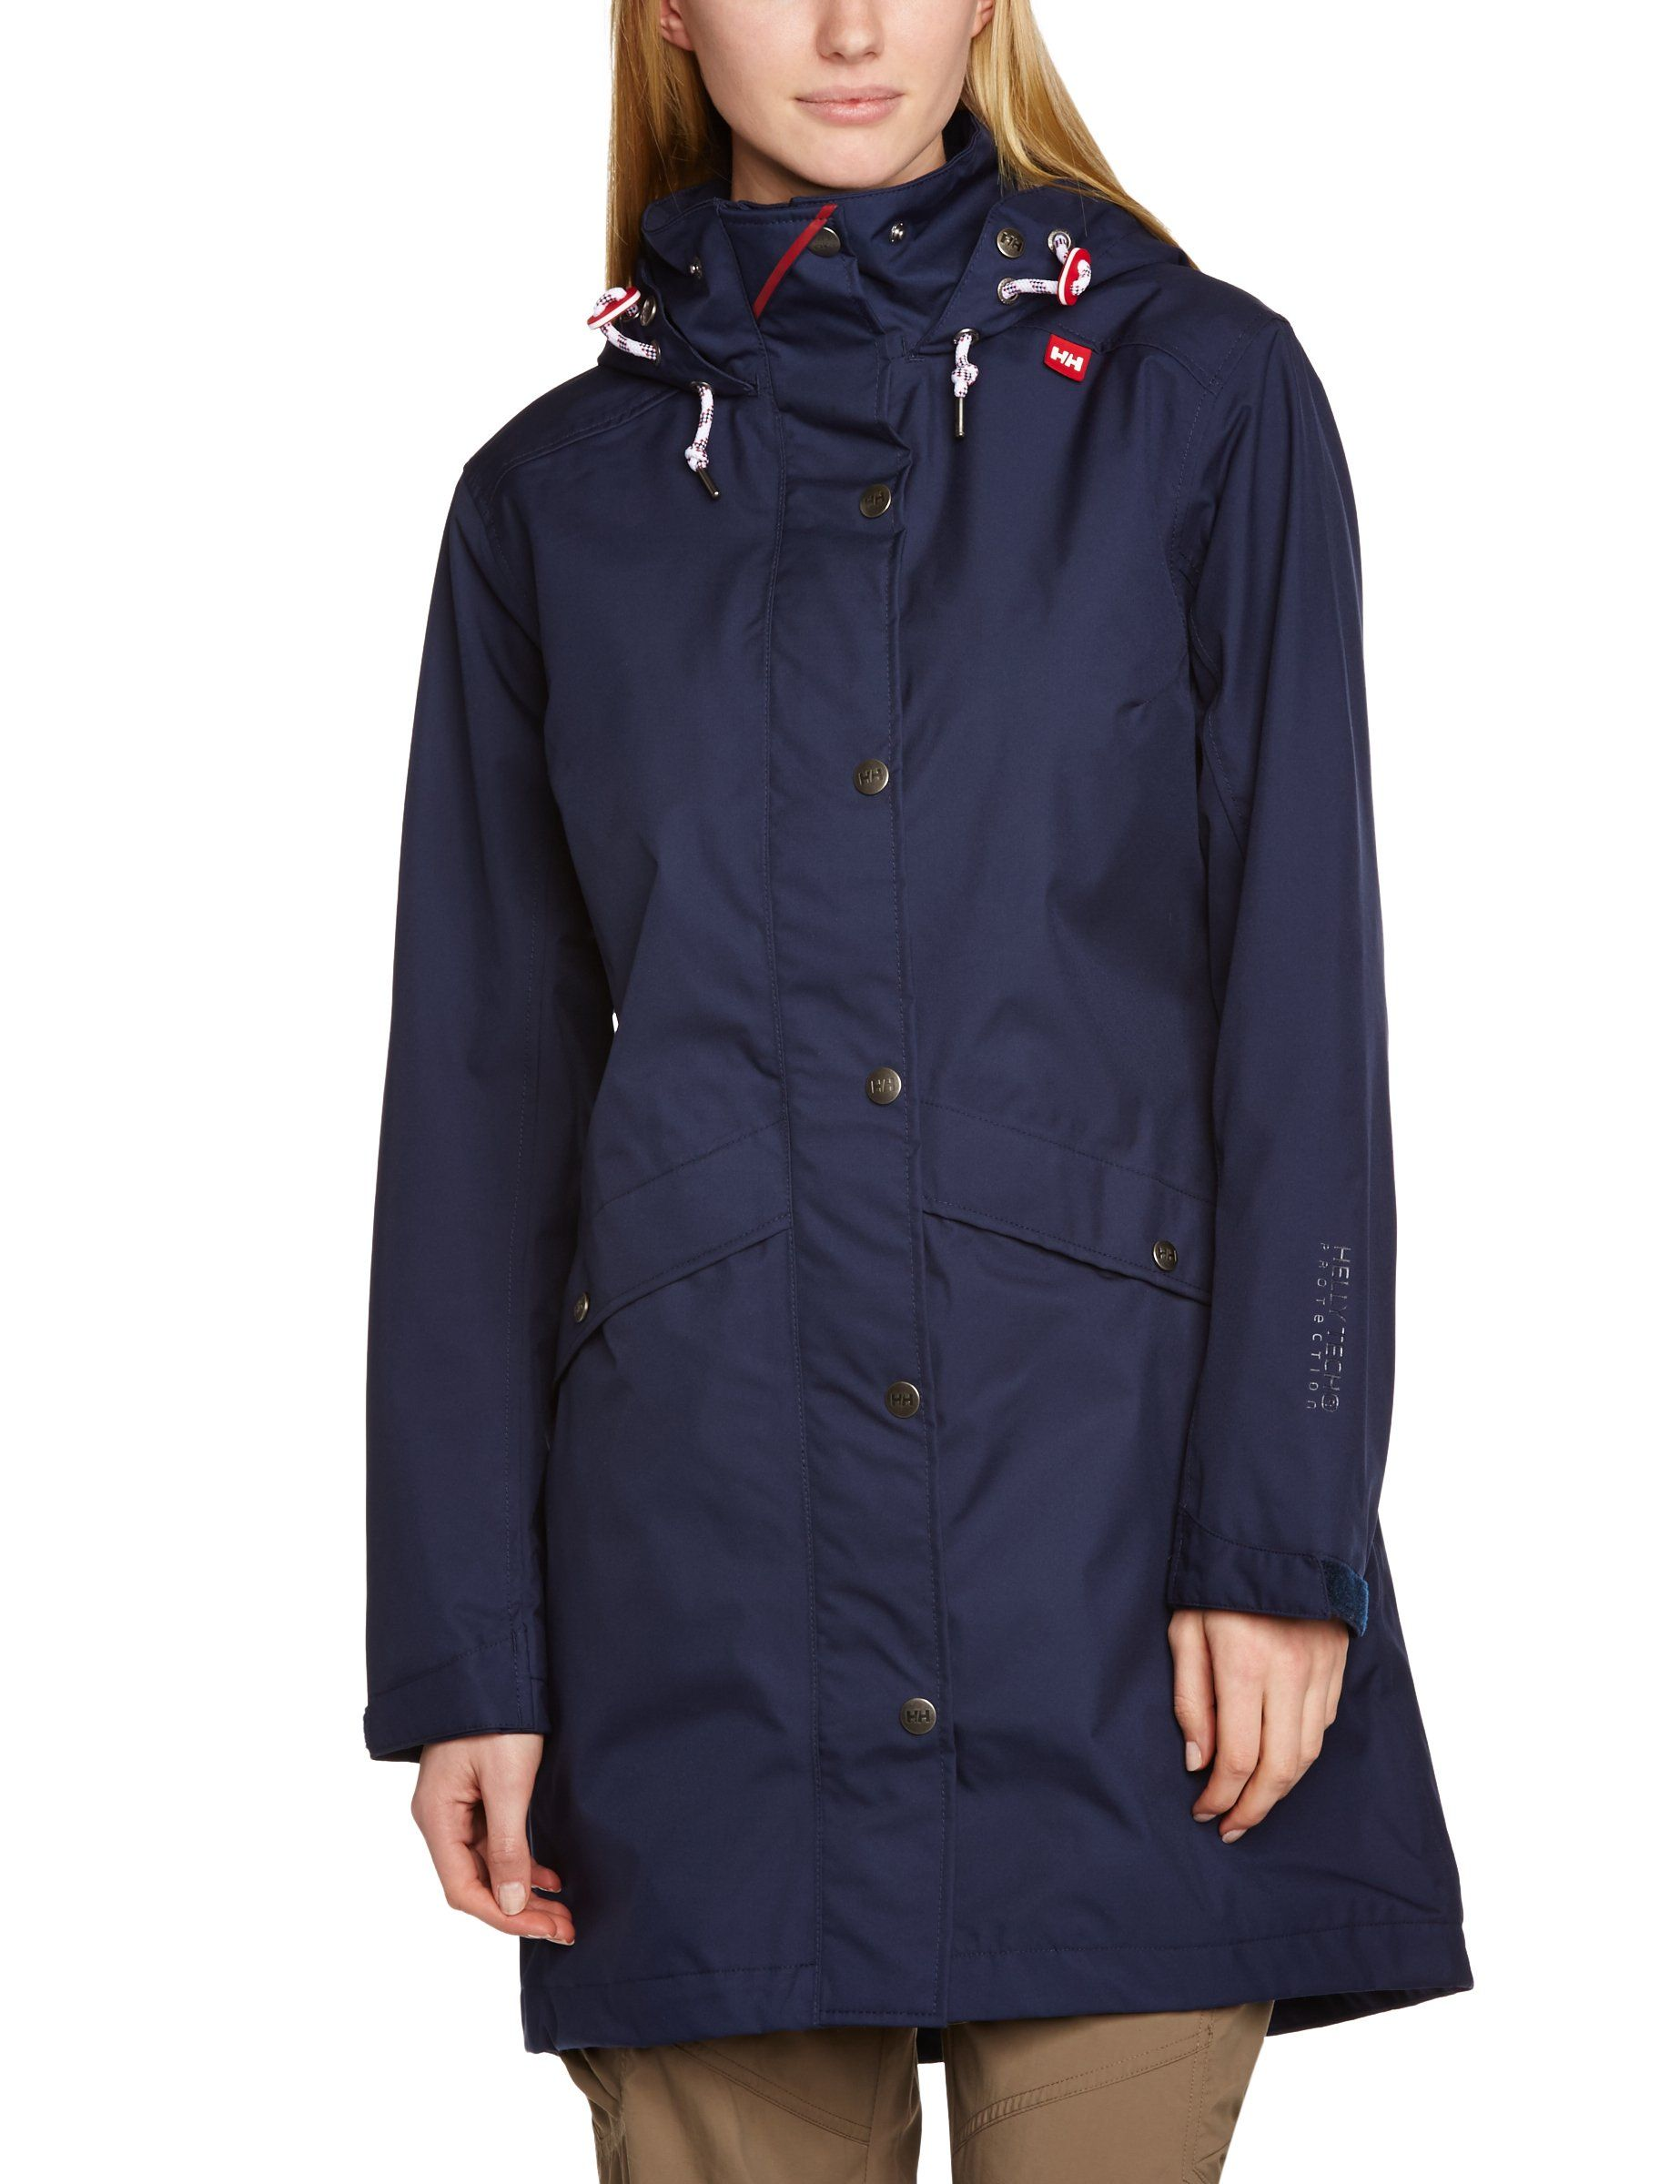 6d3b87ca8 Amazon.com: Helly Hansen Women's Blackrock Coat, Evening Blue, Medium:  Sports & Outdoors